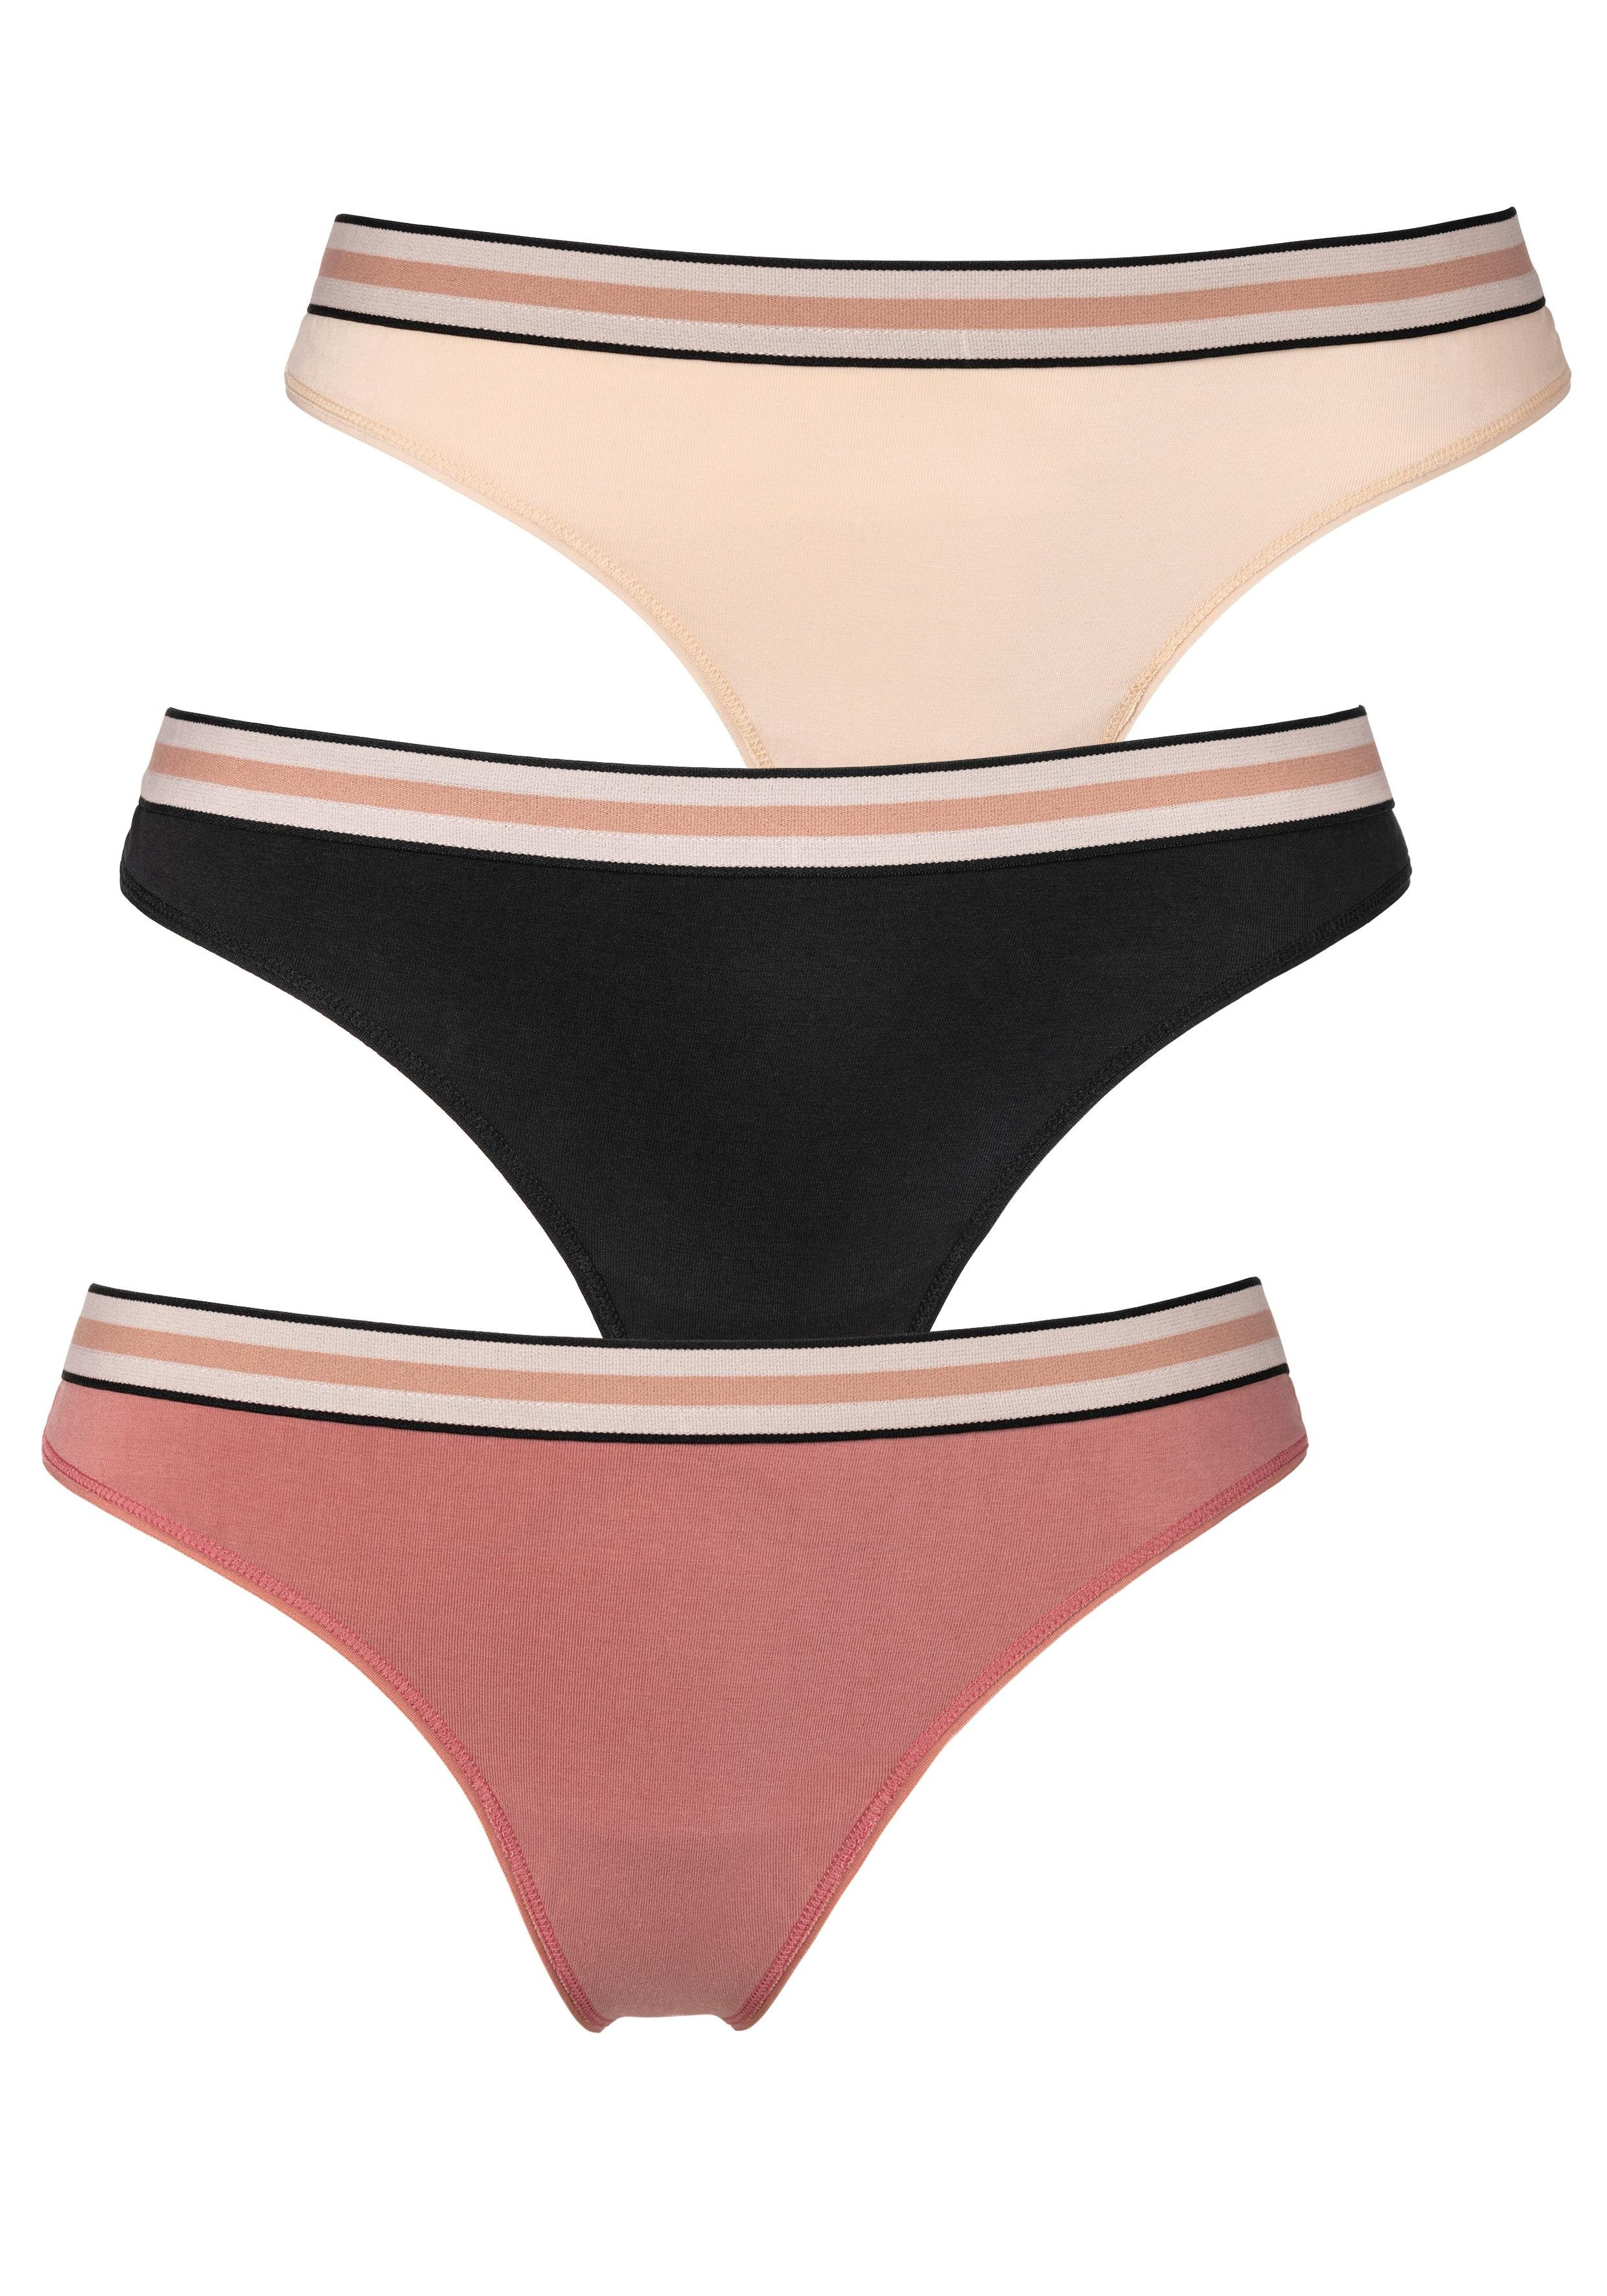 s.Oliver RED LABEL Beachwear string met zachte weefband (3 stuks) goedkoop op lascana.nl kopen